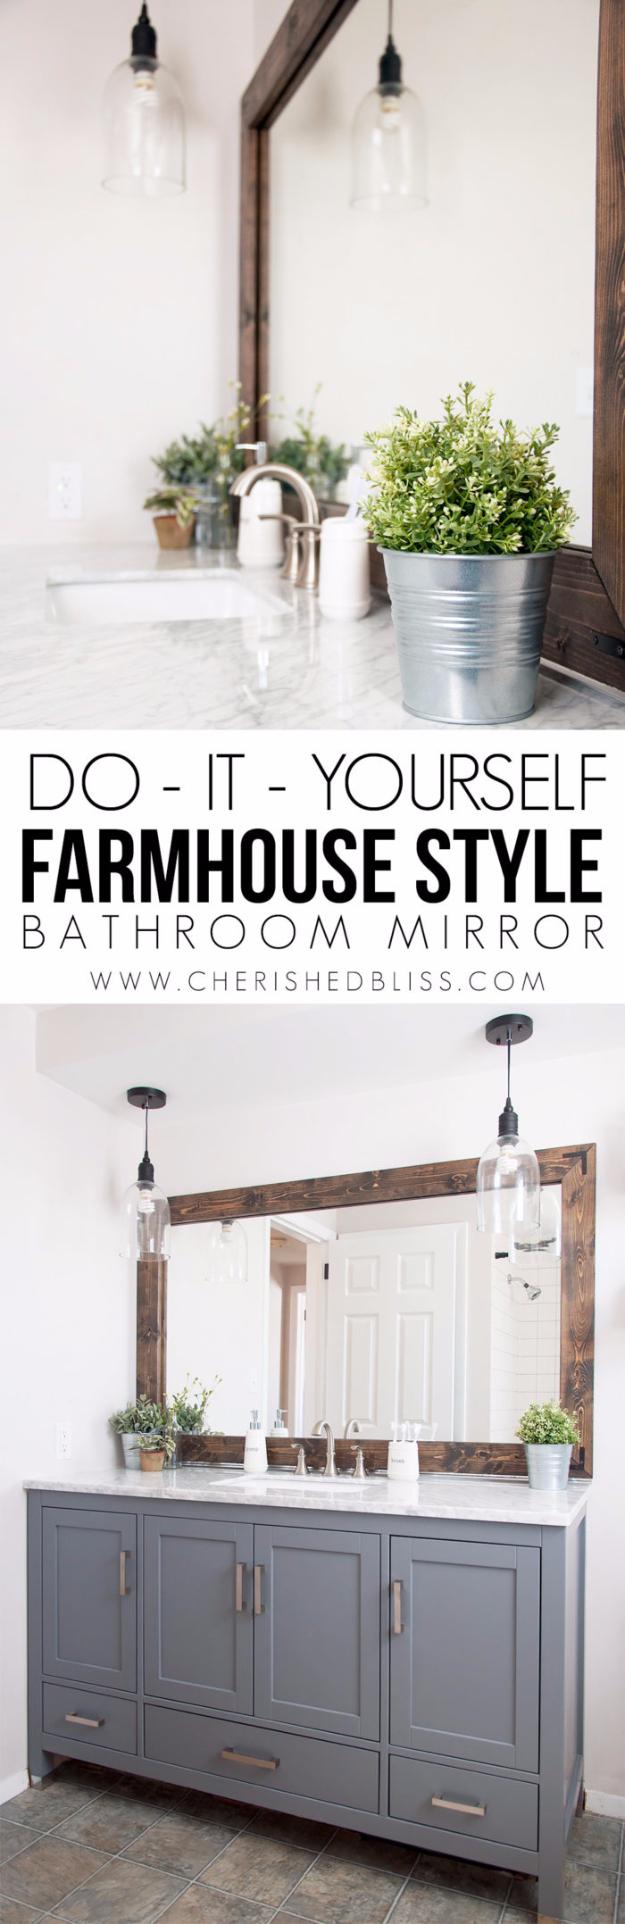 41 More DIY Farmhouse Style Decor Ideas   Farmhouse Bathroom Mirror  Tutorial   Creative Rustic Ideas